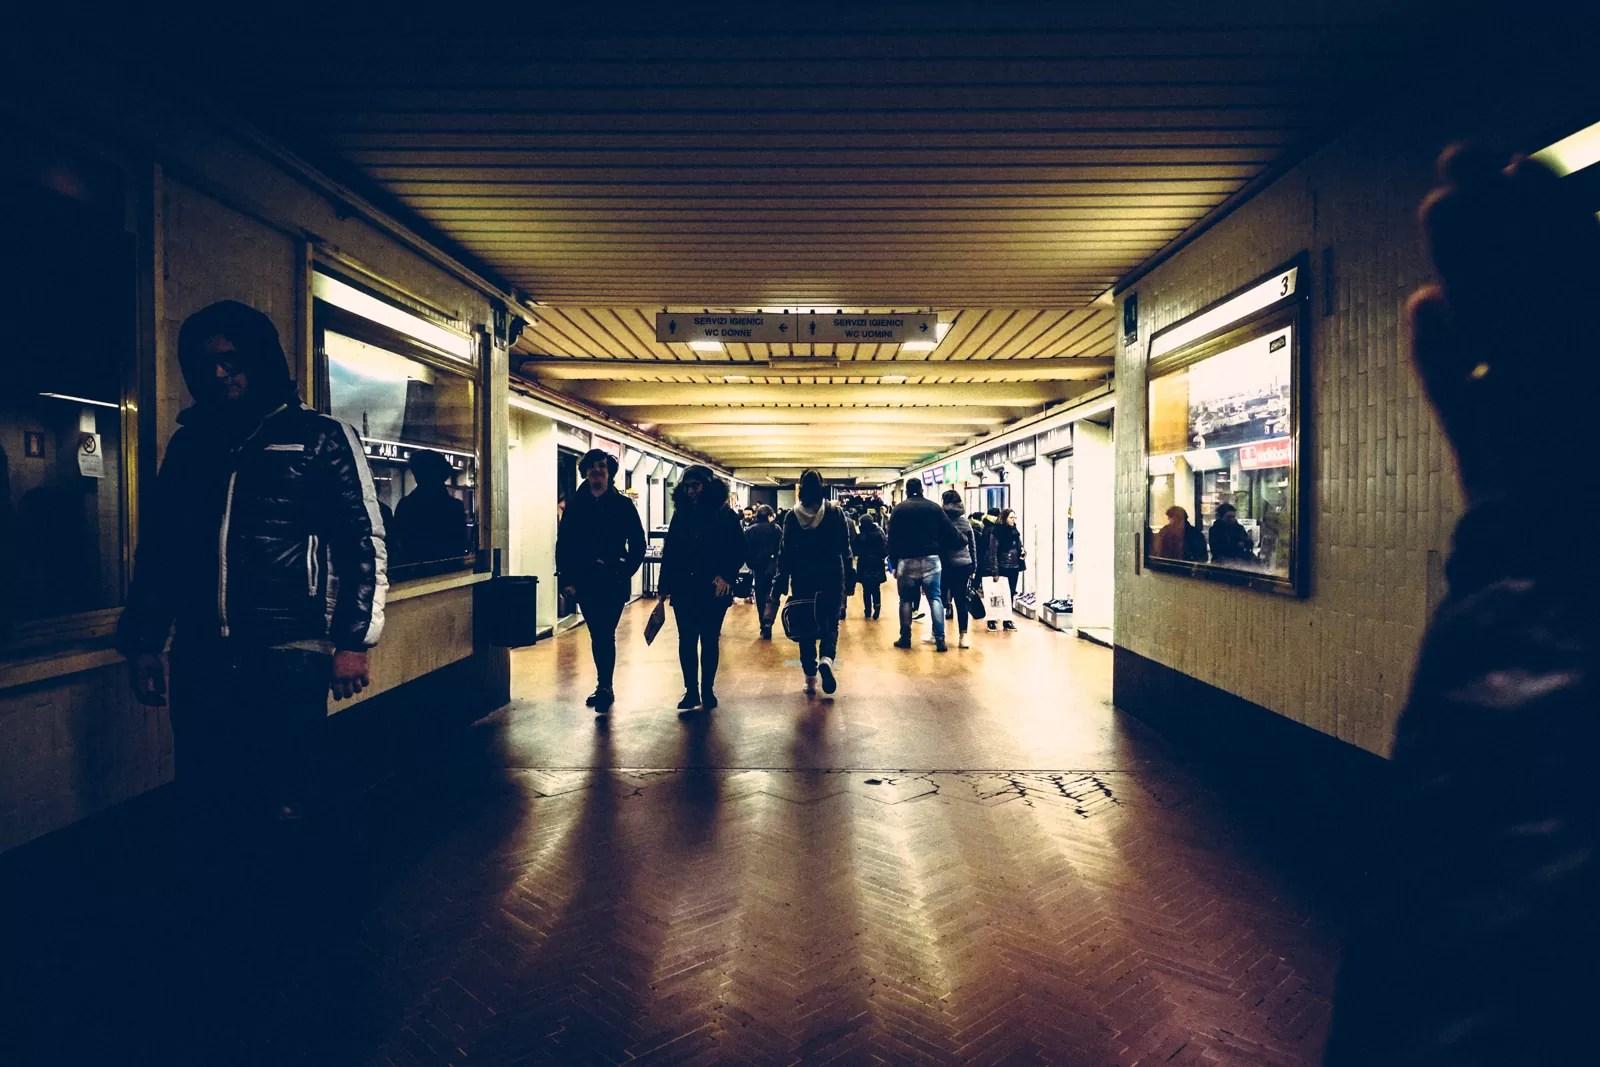 DSCF7822 - Foto fatte a c...? - Pensieri condivisi sulla street photography - fotostreet.it